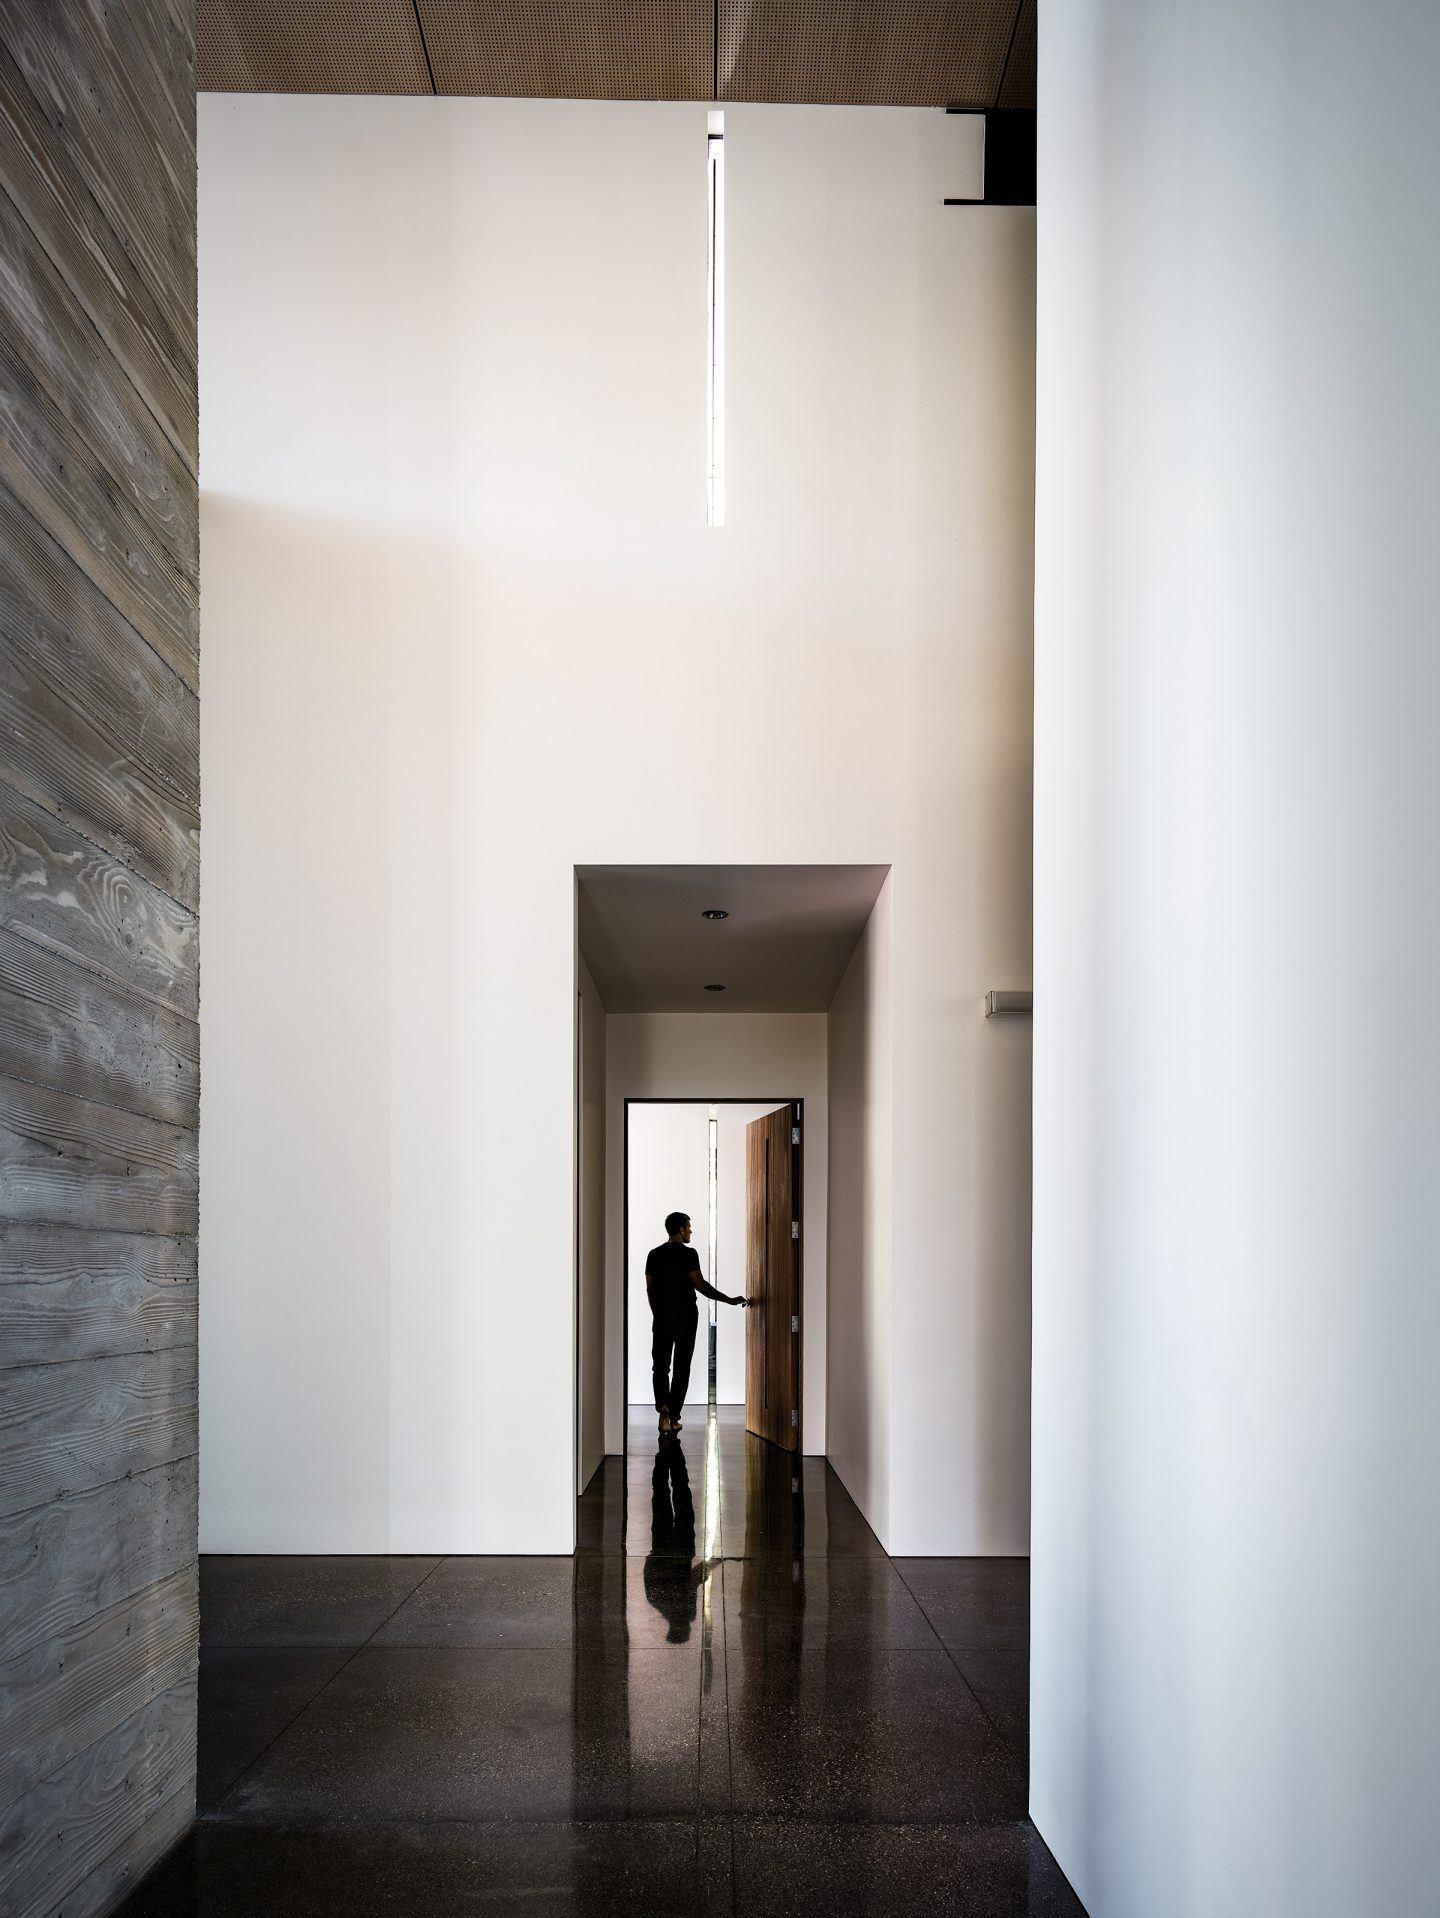 IGNANT-Architecture-Faulkner-Architects-Burnt-Cedar-04